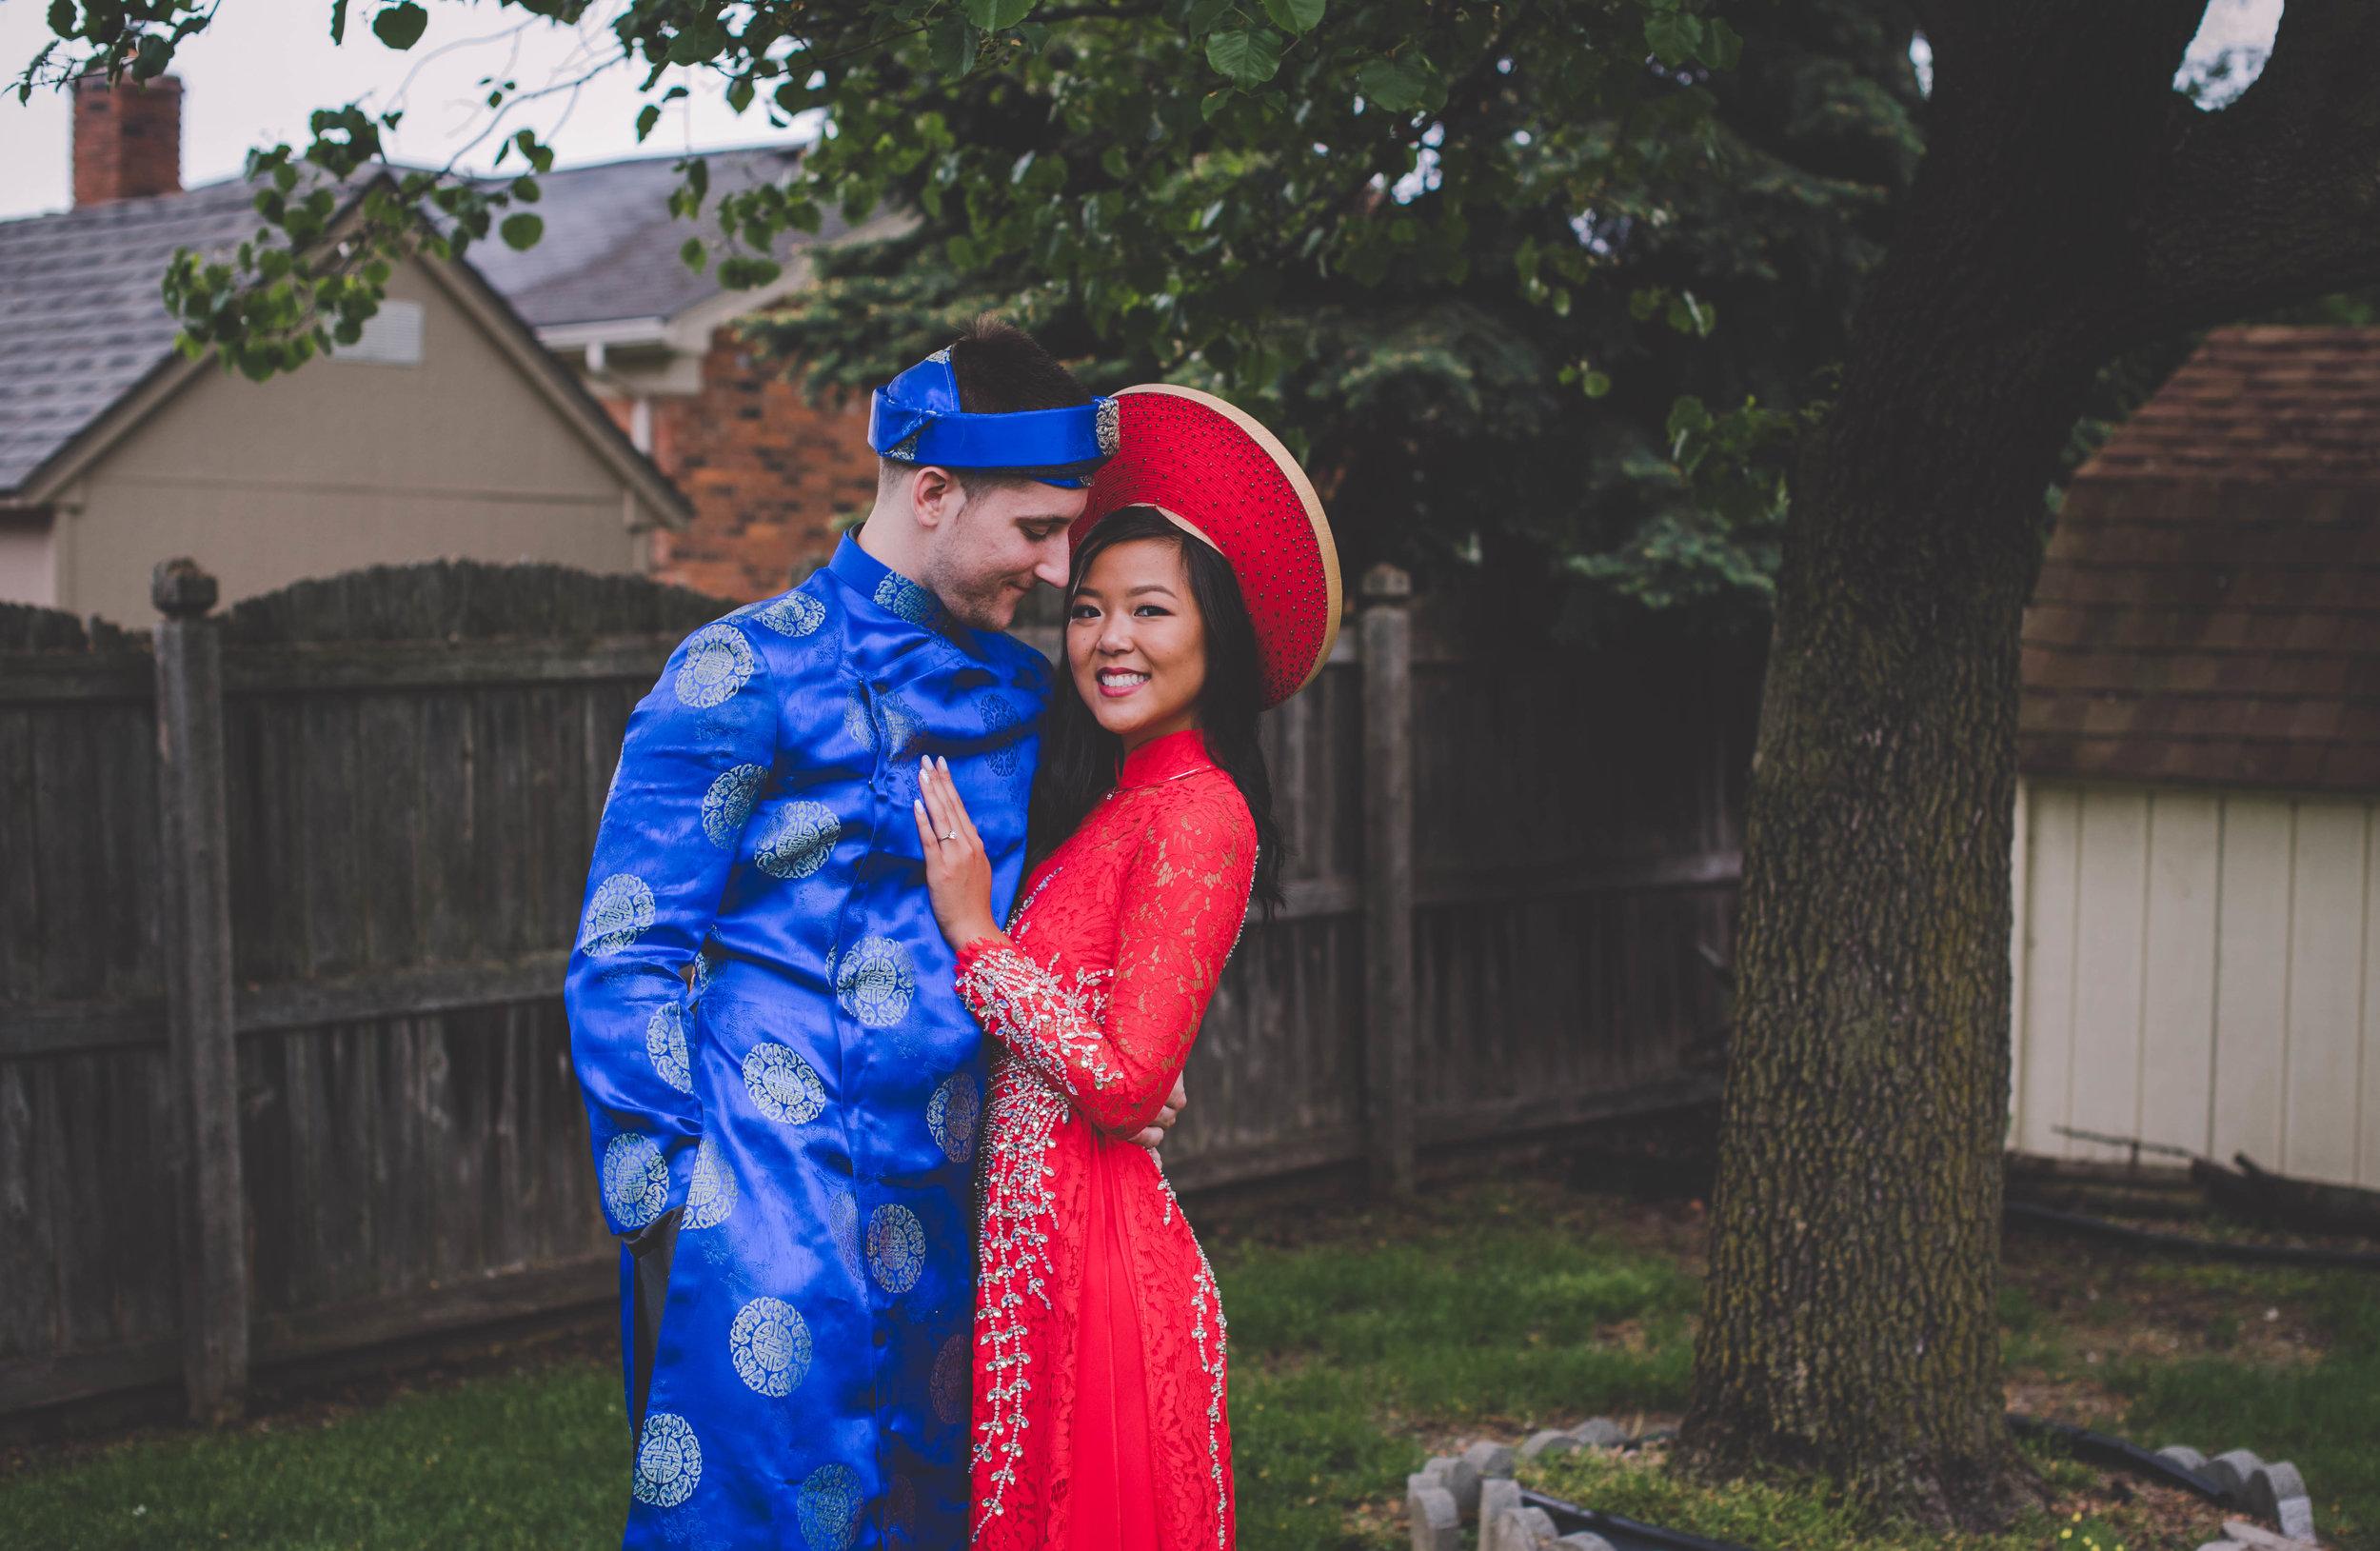 Vietnamese wedding, Port huron wedding, port huron wedding photographer, ethnic wedding, Detroit wedding, Vietnamese bride, Vietnamese wedding traditions